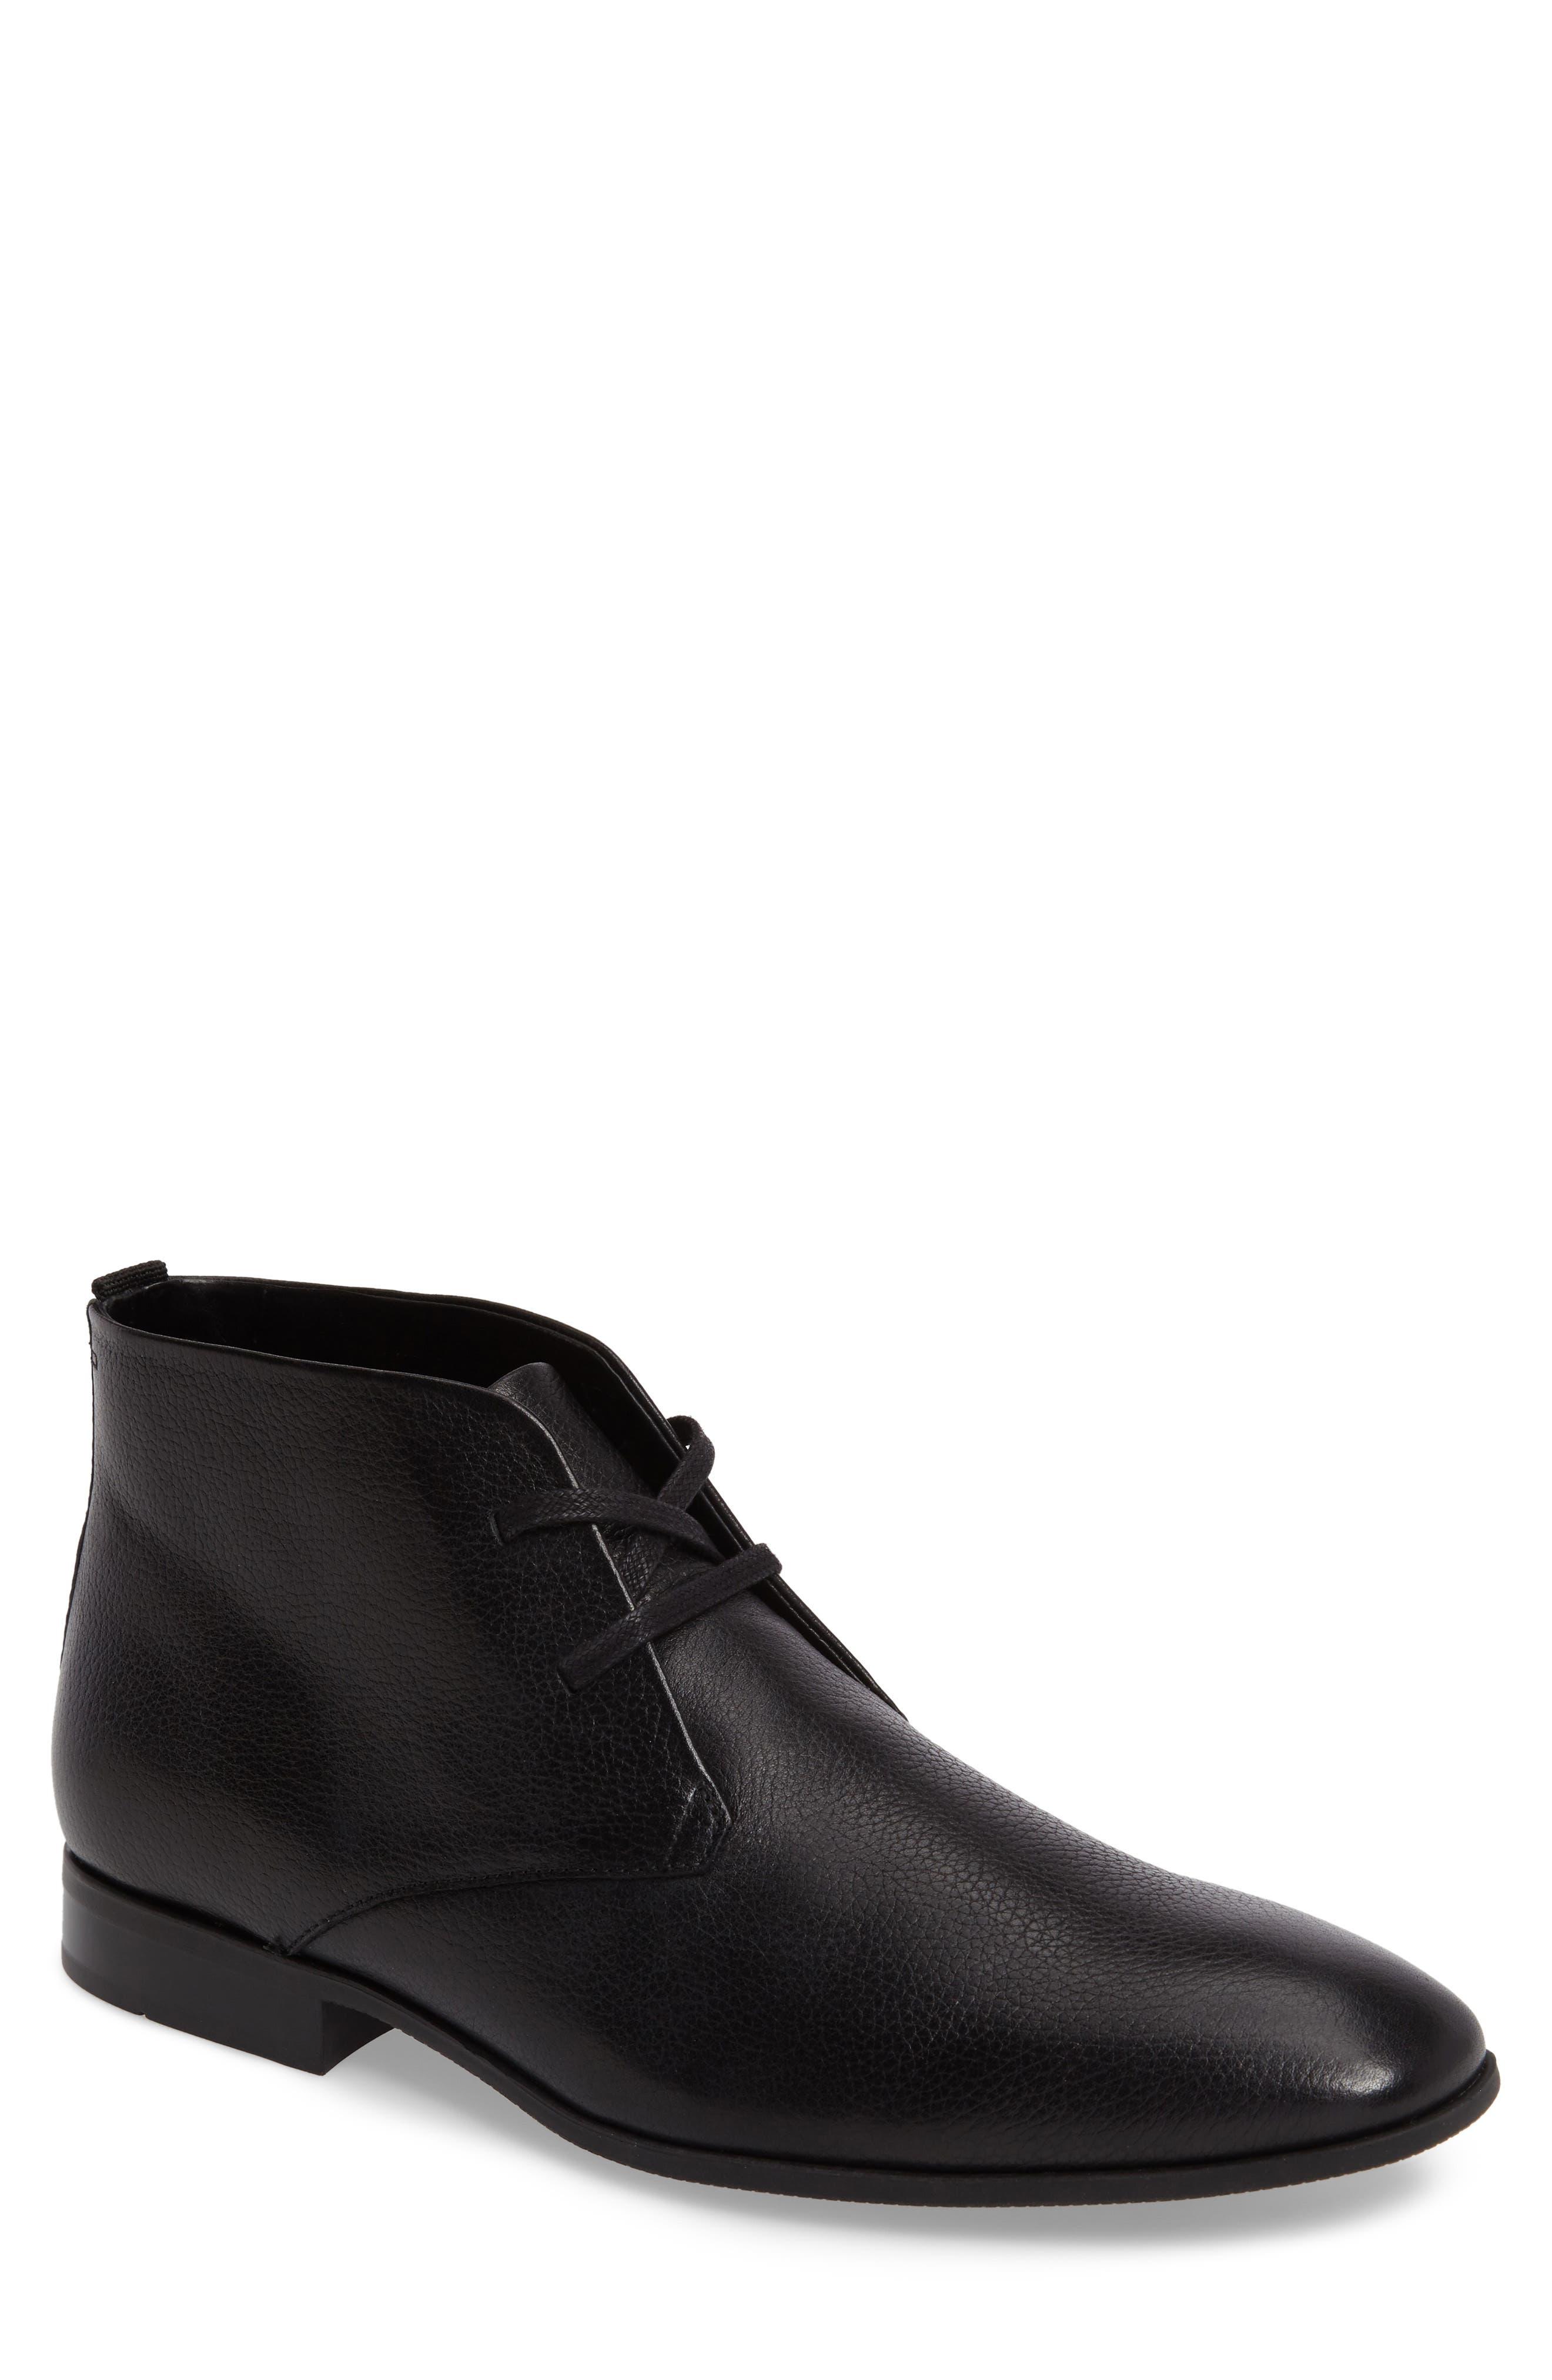 Carmichael Chukka Boot,                         Main,                         color, 001